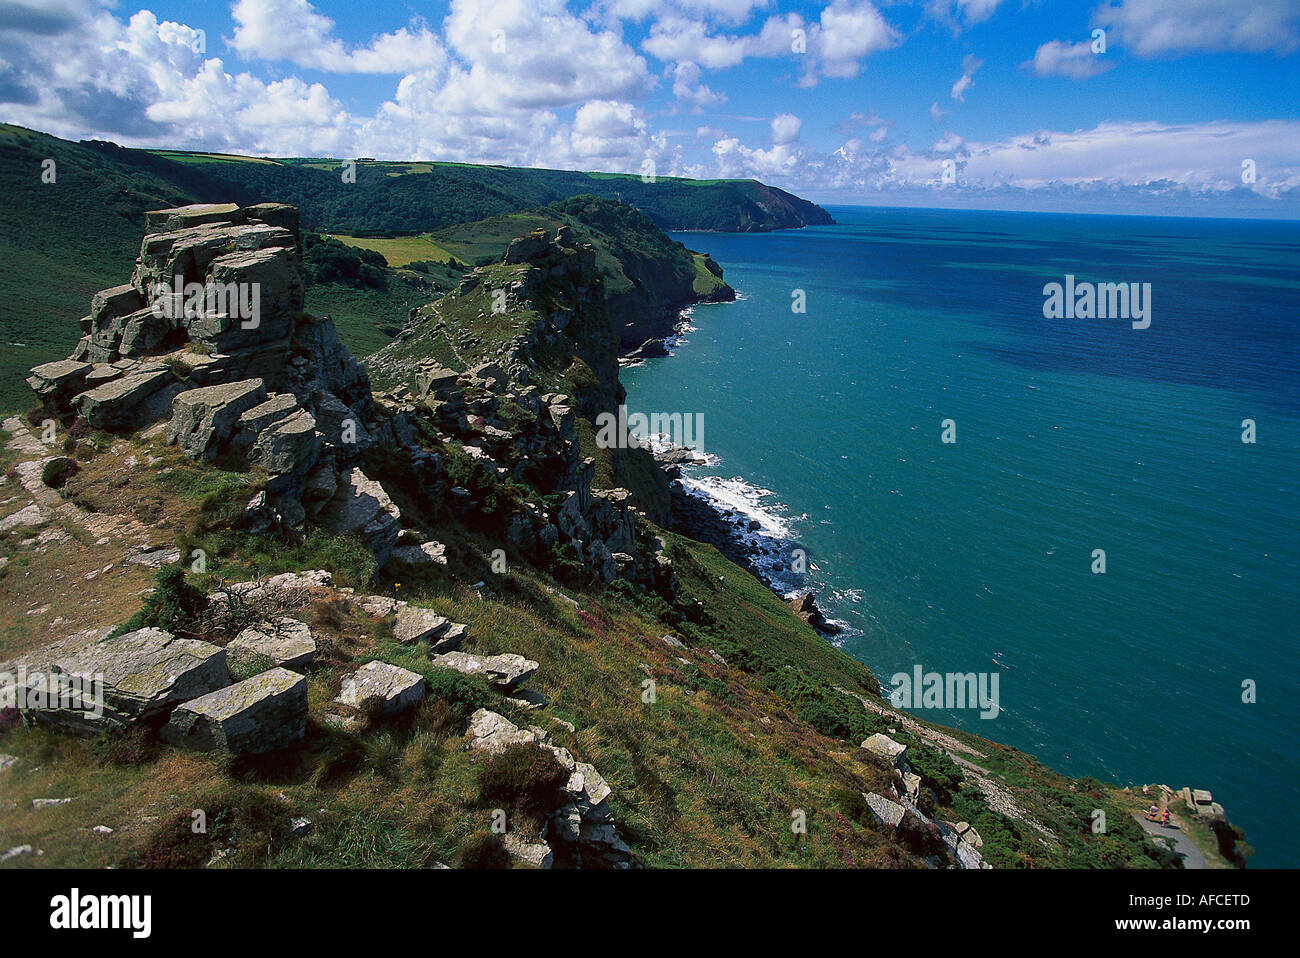 Valley of Rocks, Exmoor NP, Near Lynton Devon, England - Stock Image